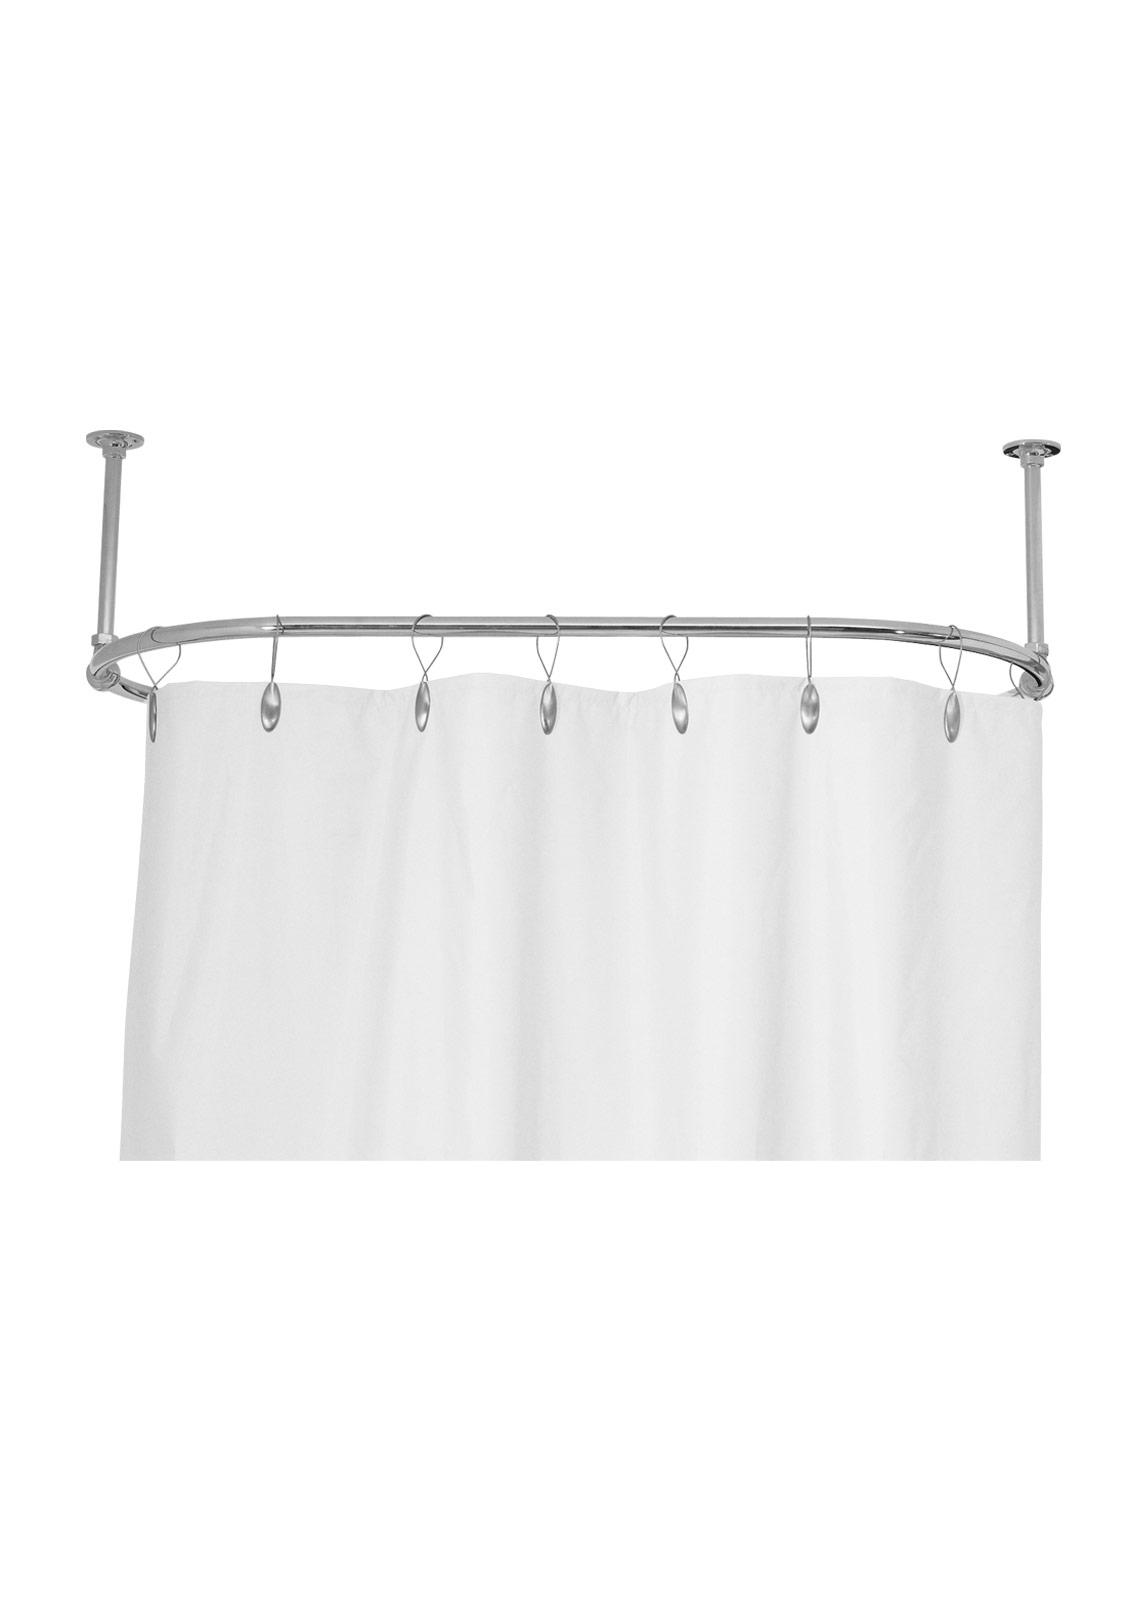 shower curtain rail gentry home